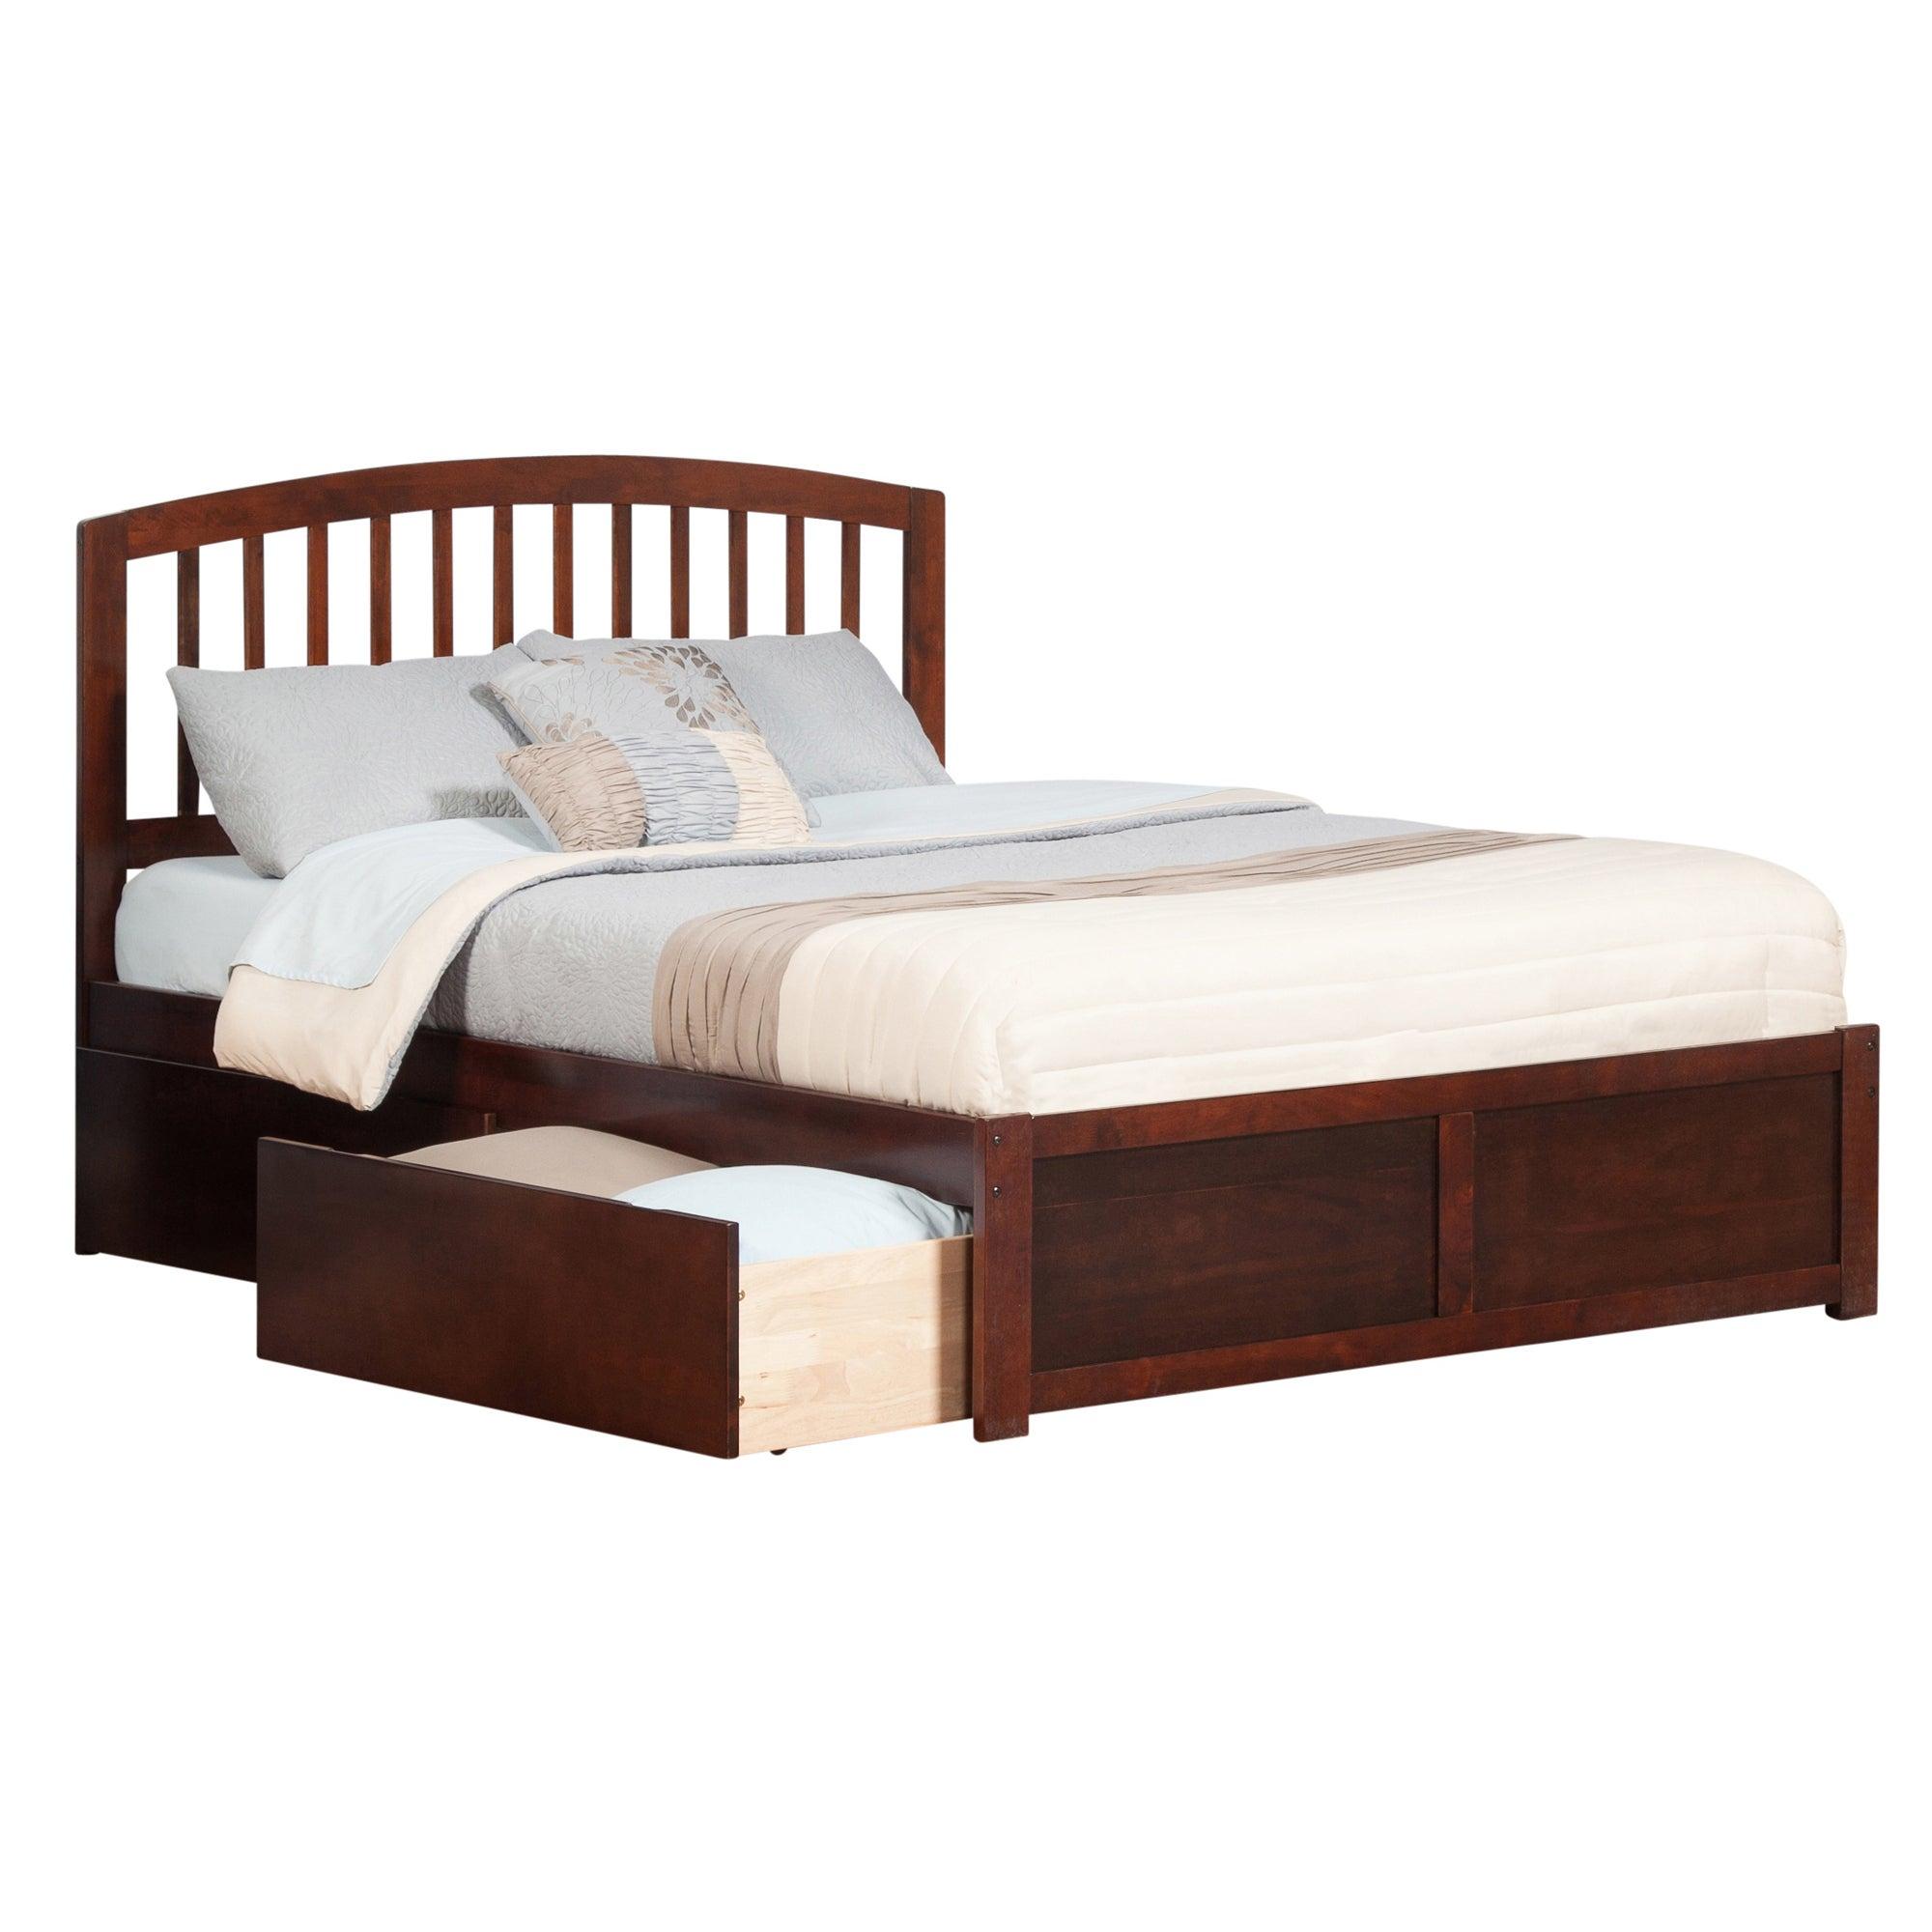 Atlantic Richmond Walnut Finish Wood King Size 2 Drawer Platform Bed